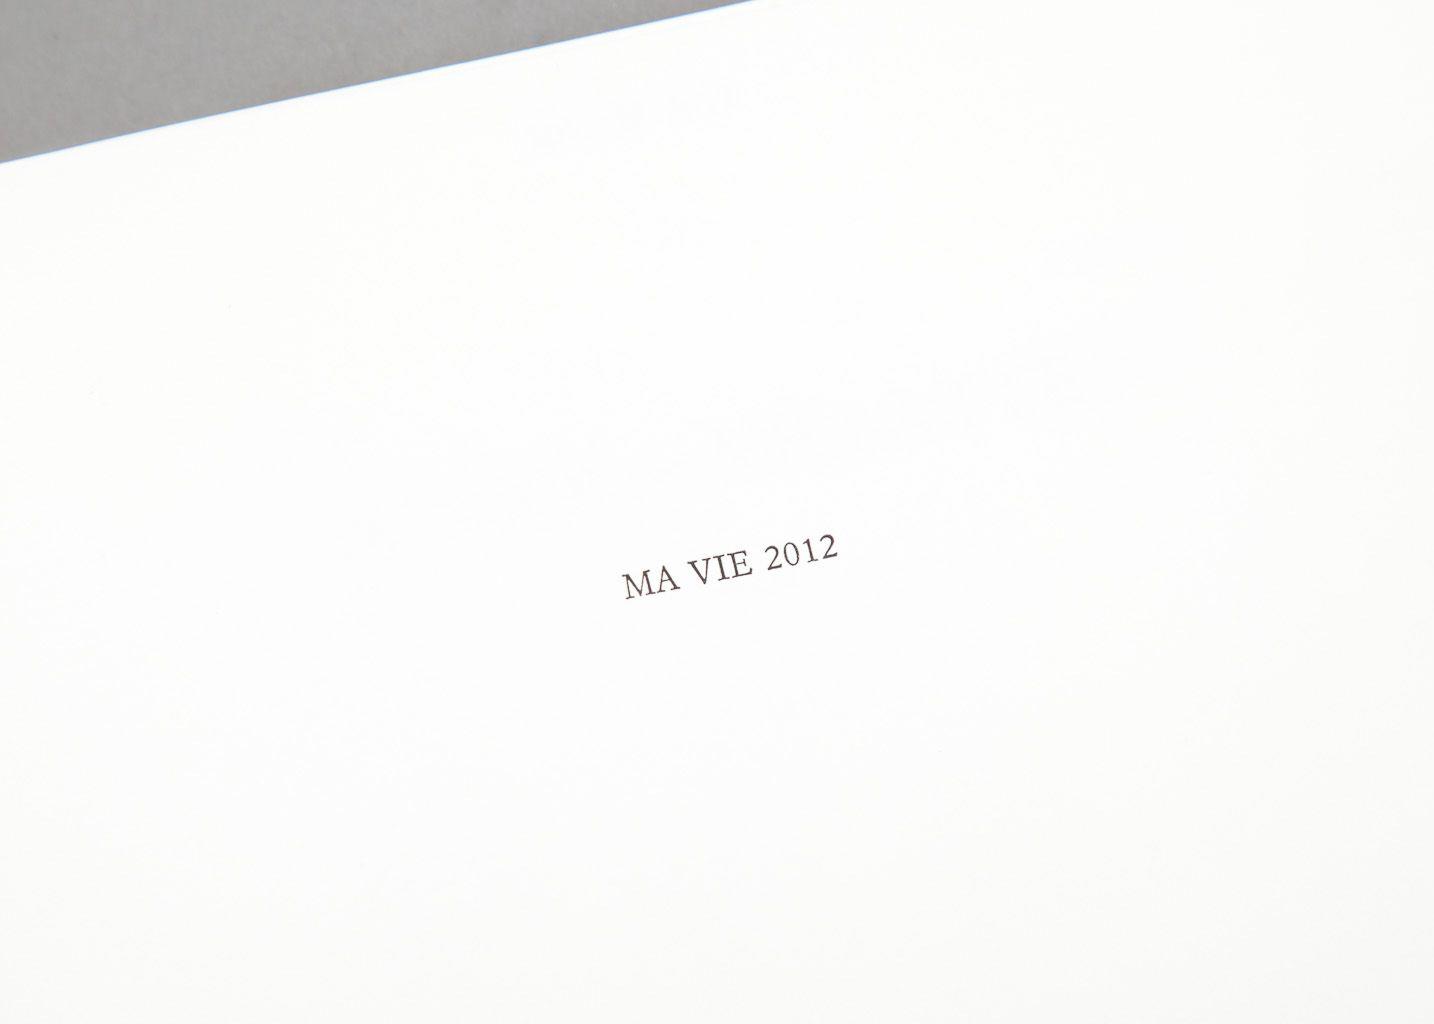 Agenda Astier de Villatte 2012 - 0fr.